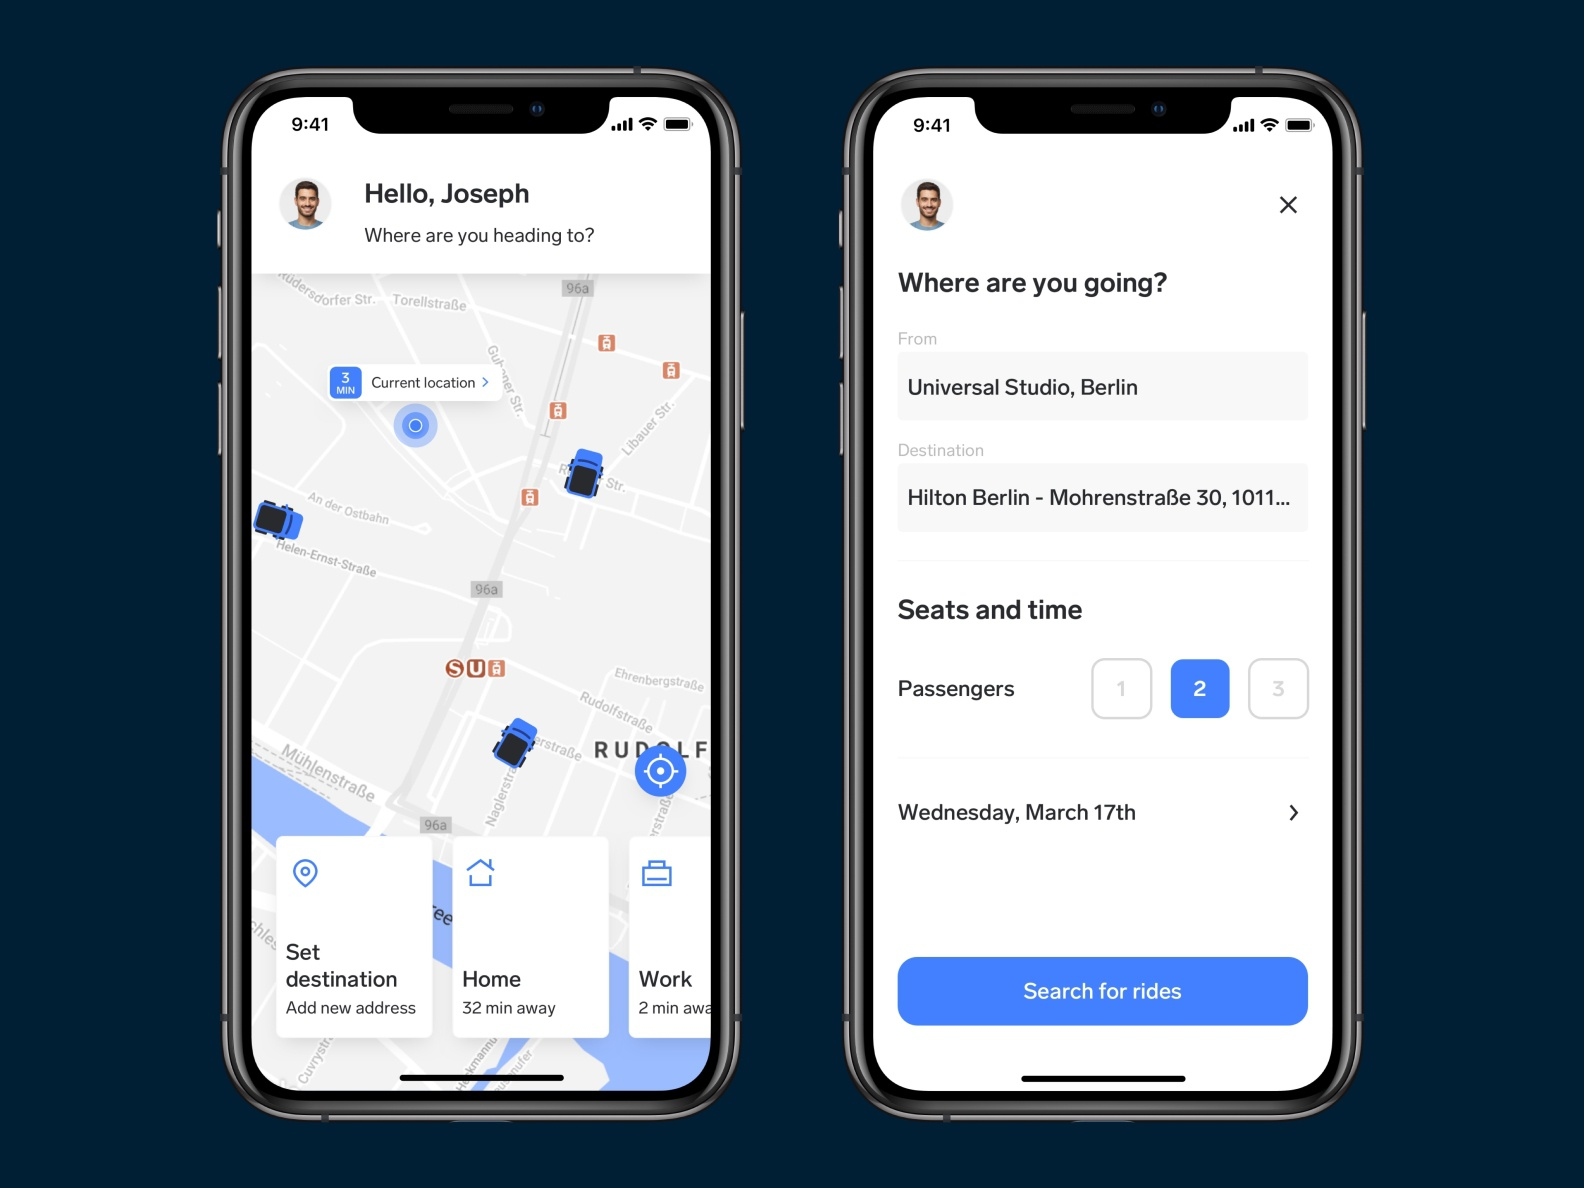 Carpool App – Set a new destination